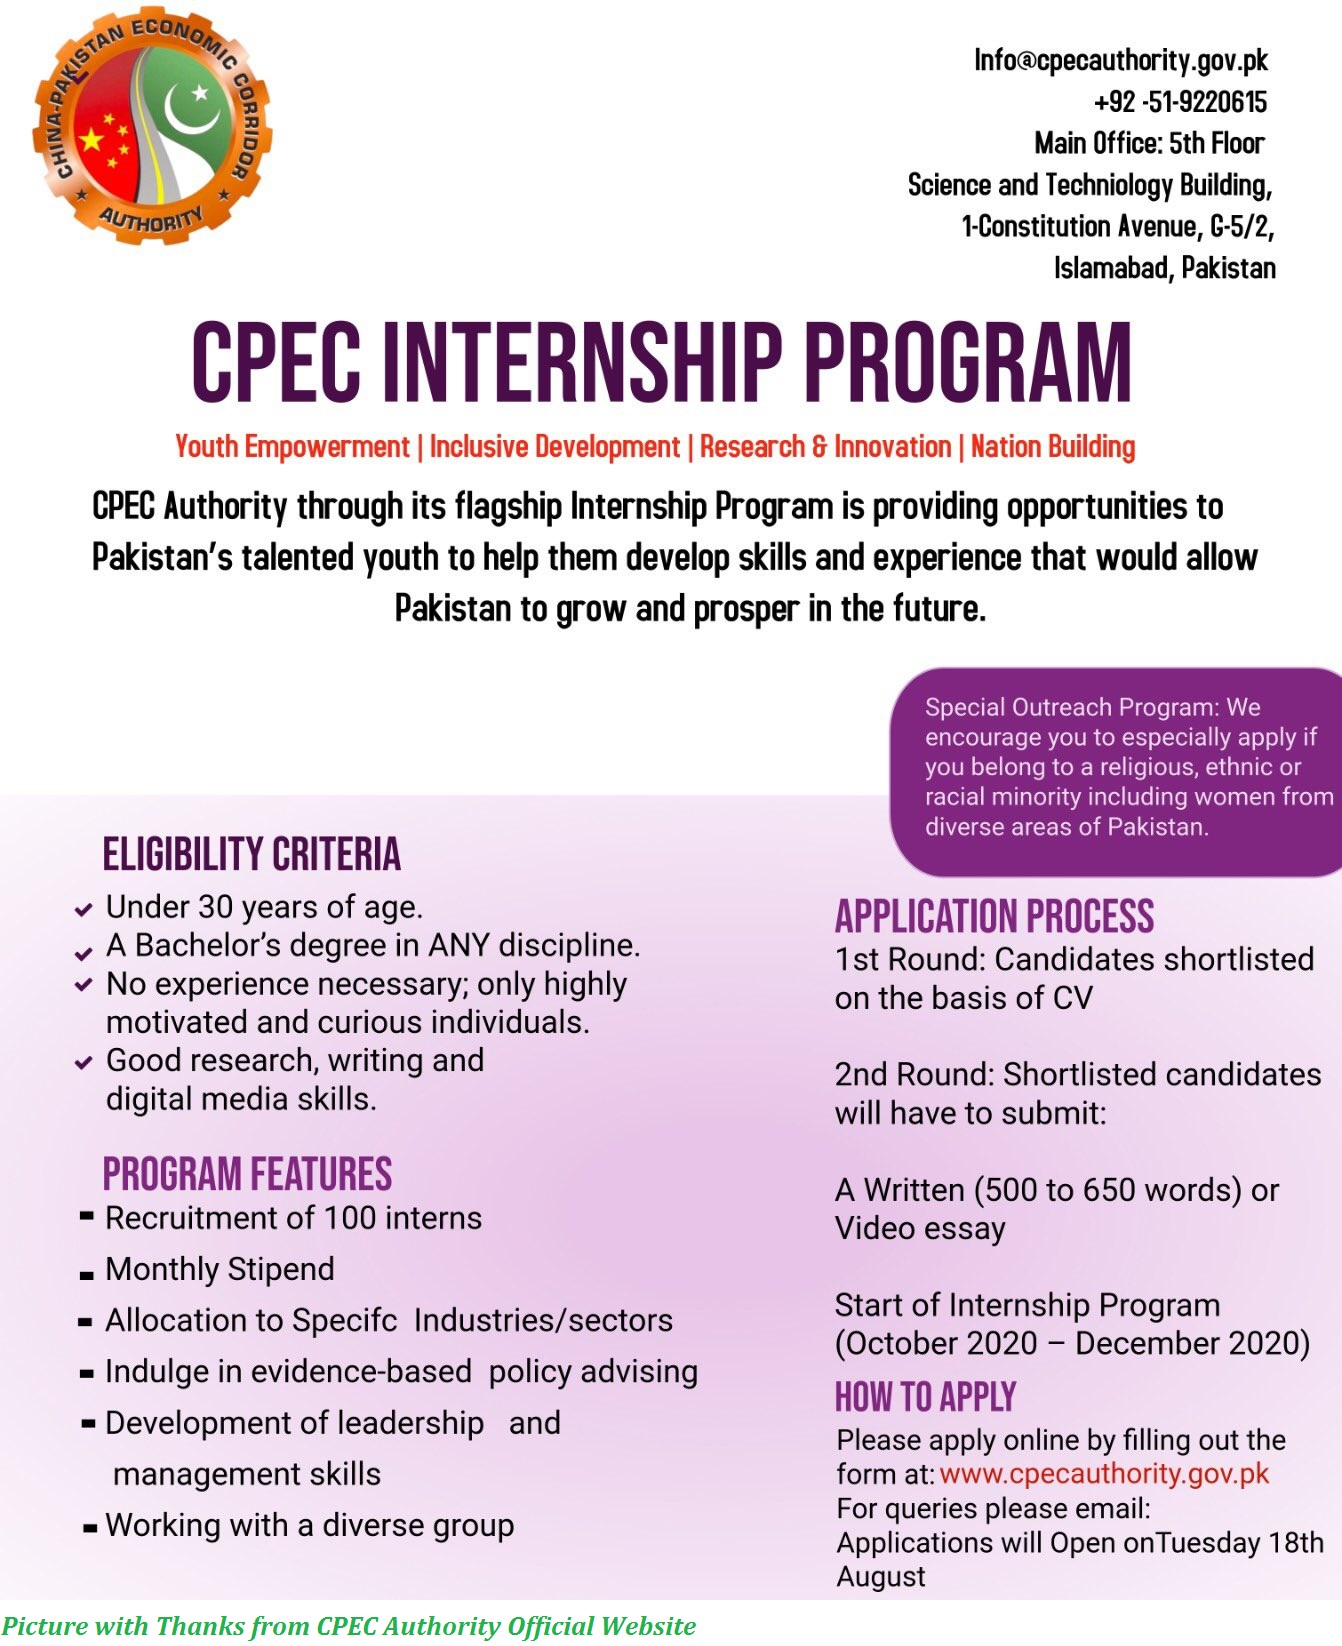 CPEC Authority Internship Program 2020 - Laest CPEC Internships 2020 All Over Pakistan